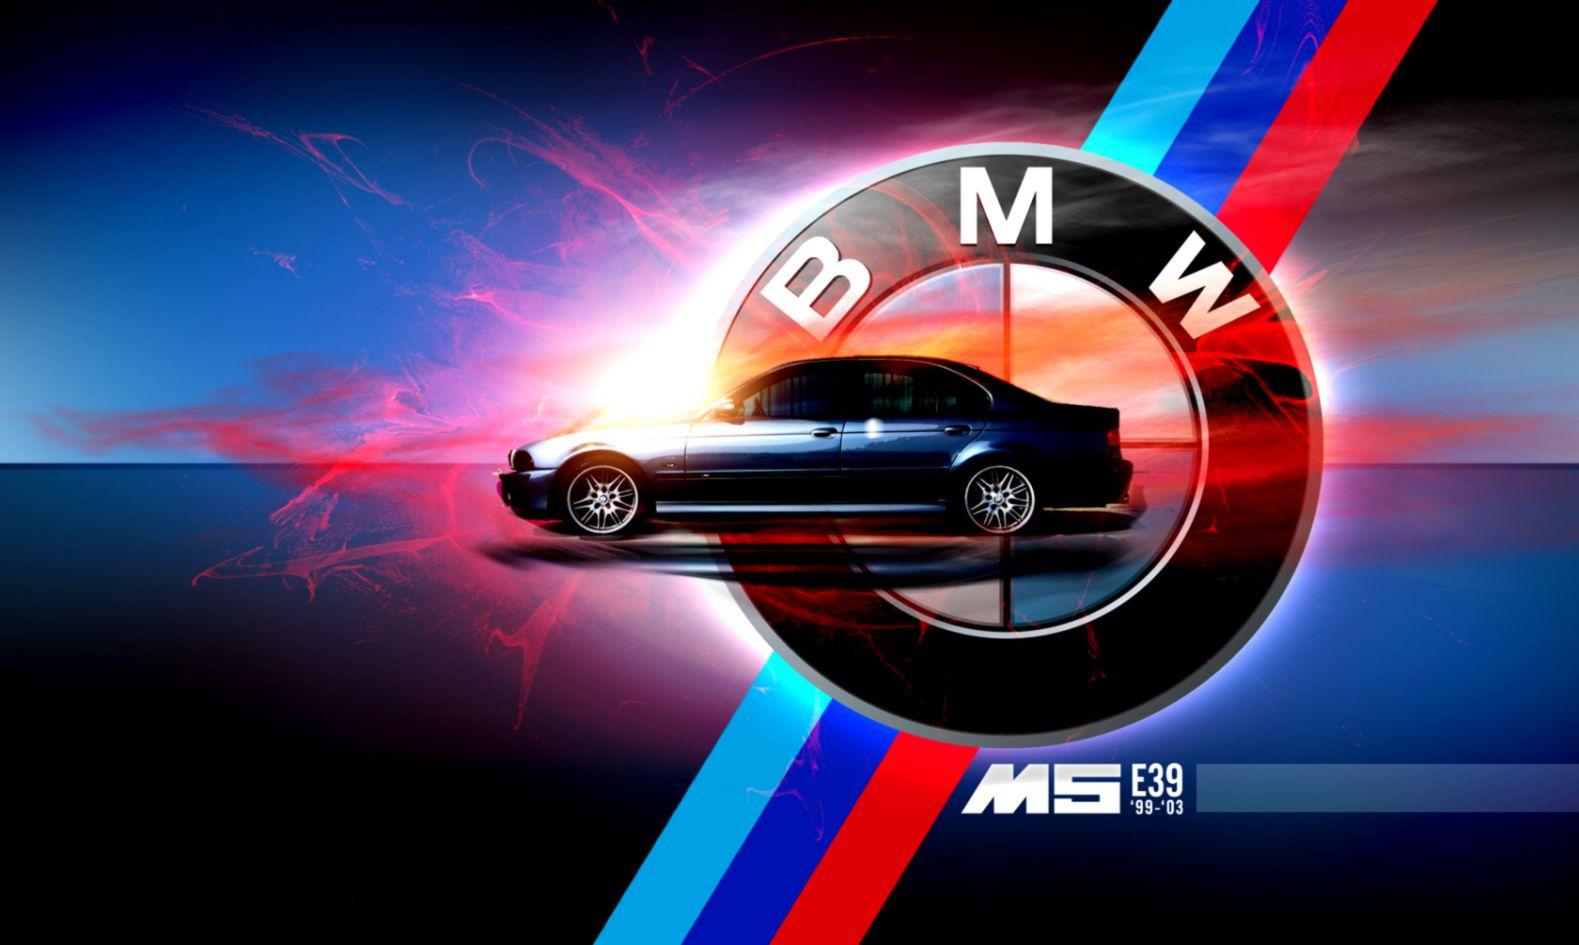 bmw m5 logo hd wallpaper best hd wallpapers. Black Bedroom Furniture Sets. Home Design Ideas